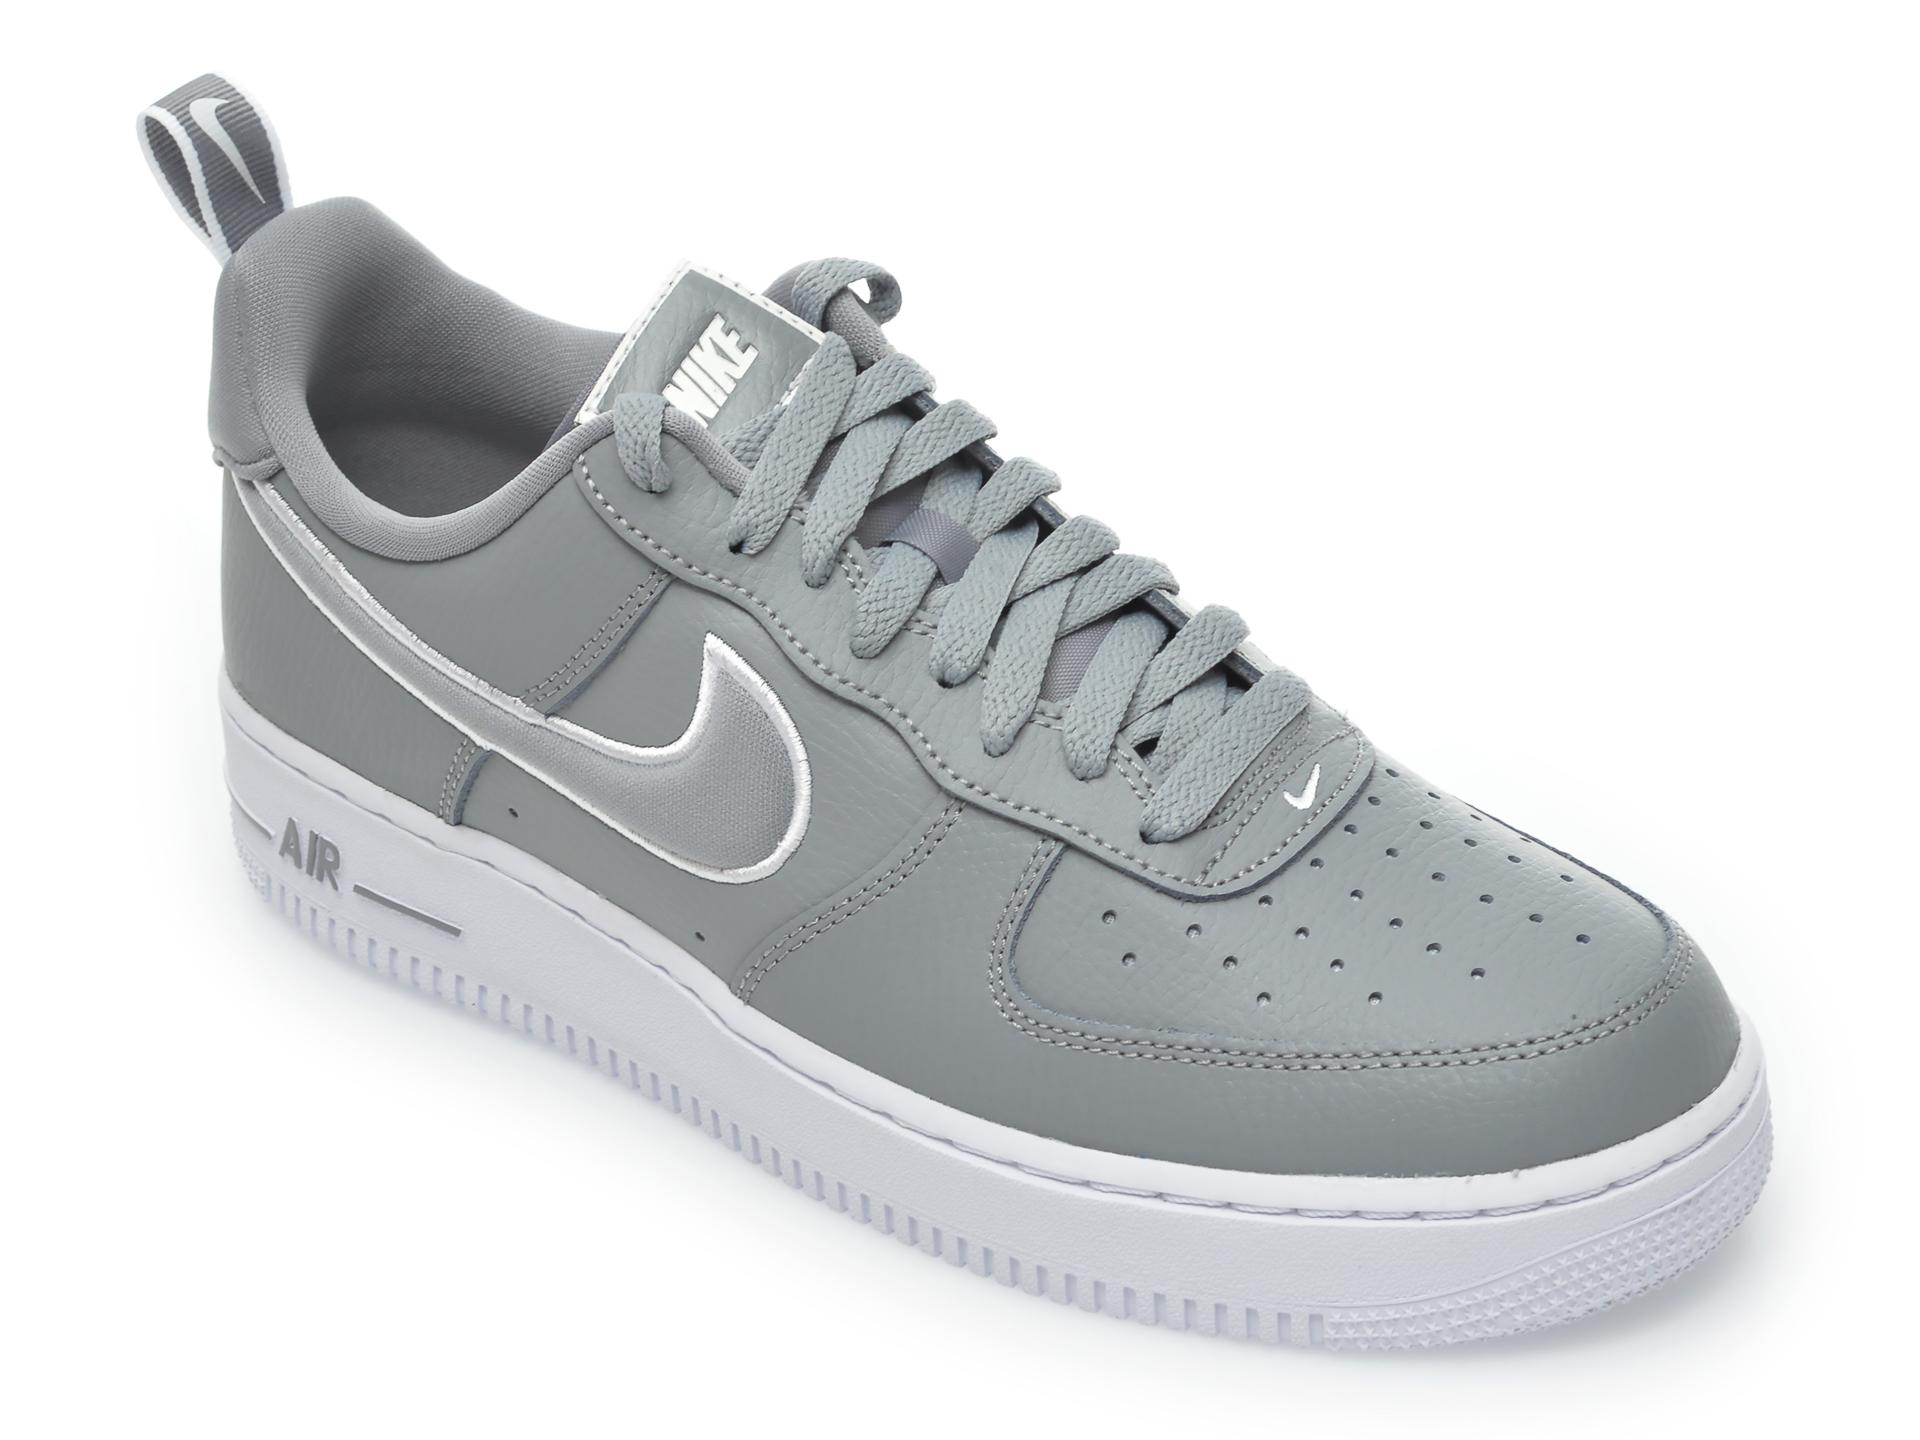 Pantofi sport NIKE gri, Nike Air Force 1, din piele naturala imagine